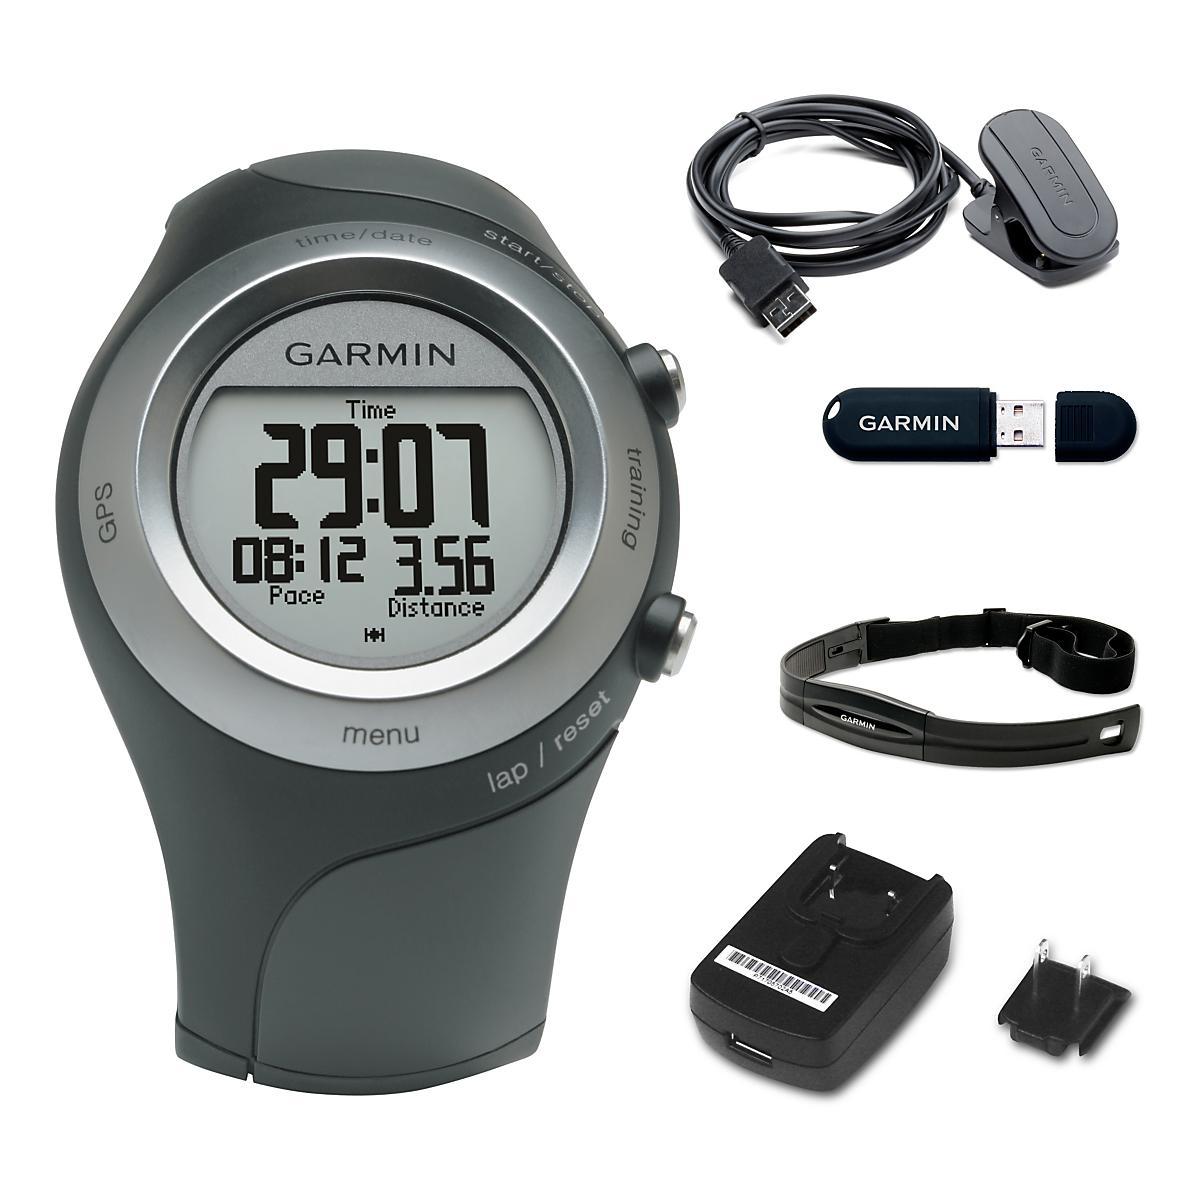 Garmin Forerunner 405 Monitor At Road Runner Sports